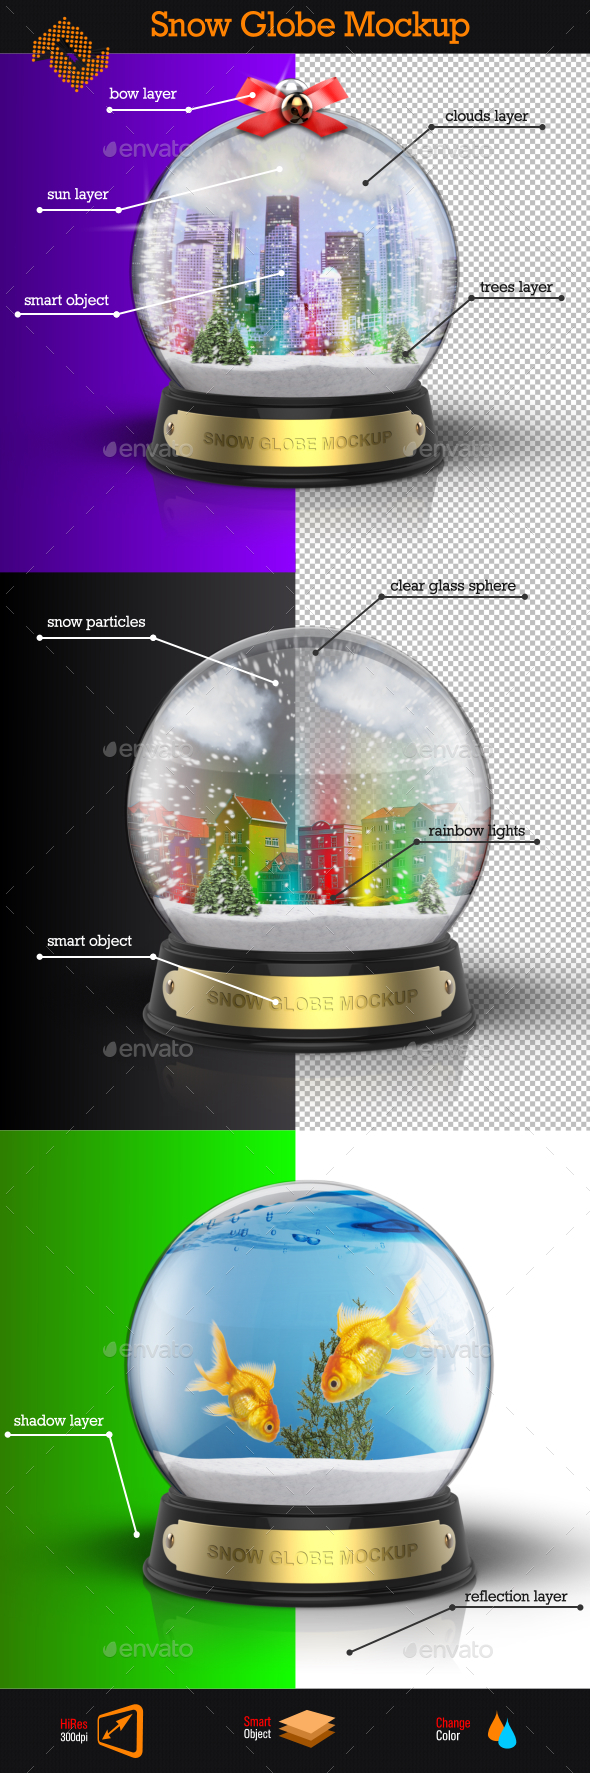 Snow Globe Mockup - Product Mock-Ups Graphics